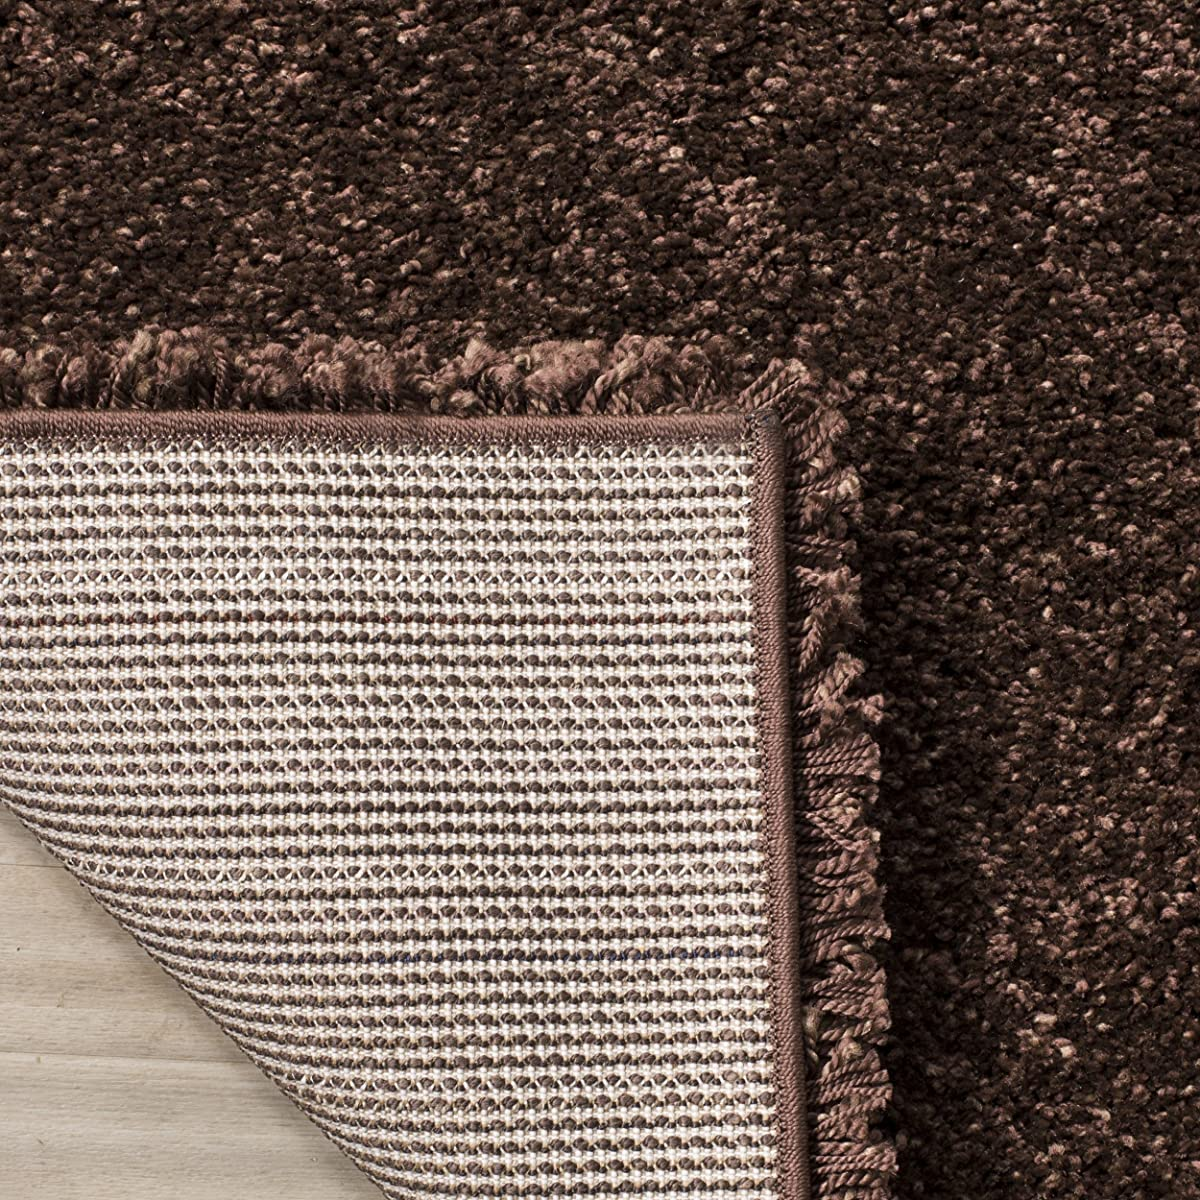 Safavieh Milan Shag Collection SG180-2525 Brown Area Rug (4 x 6)